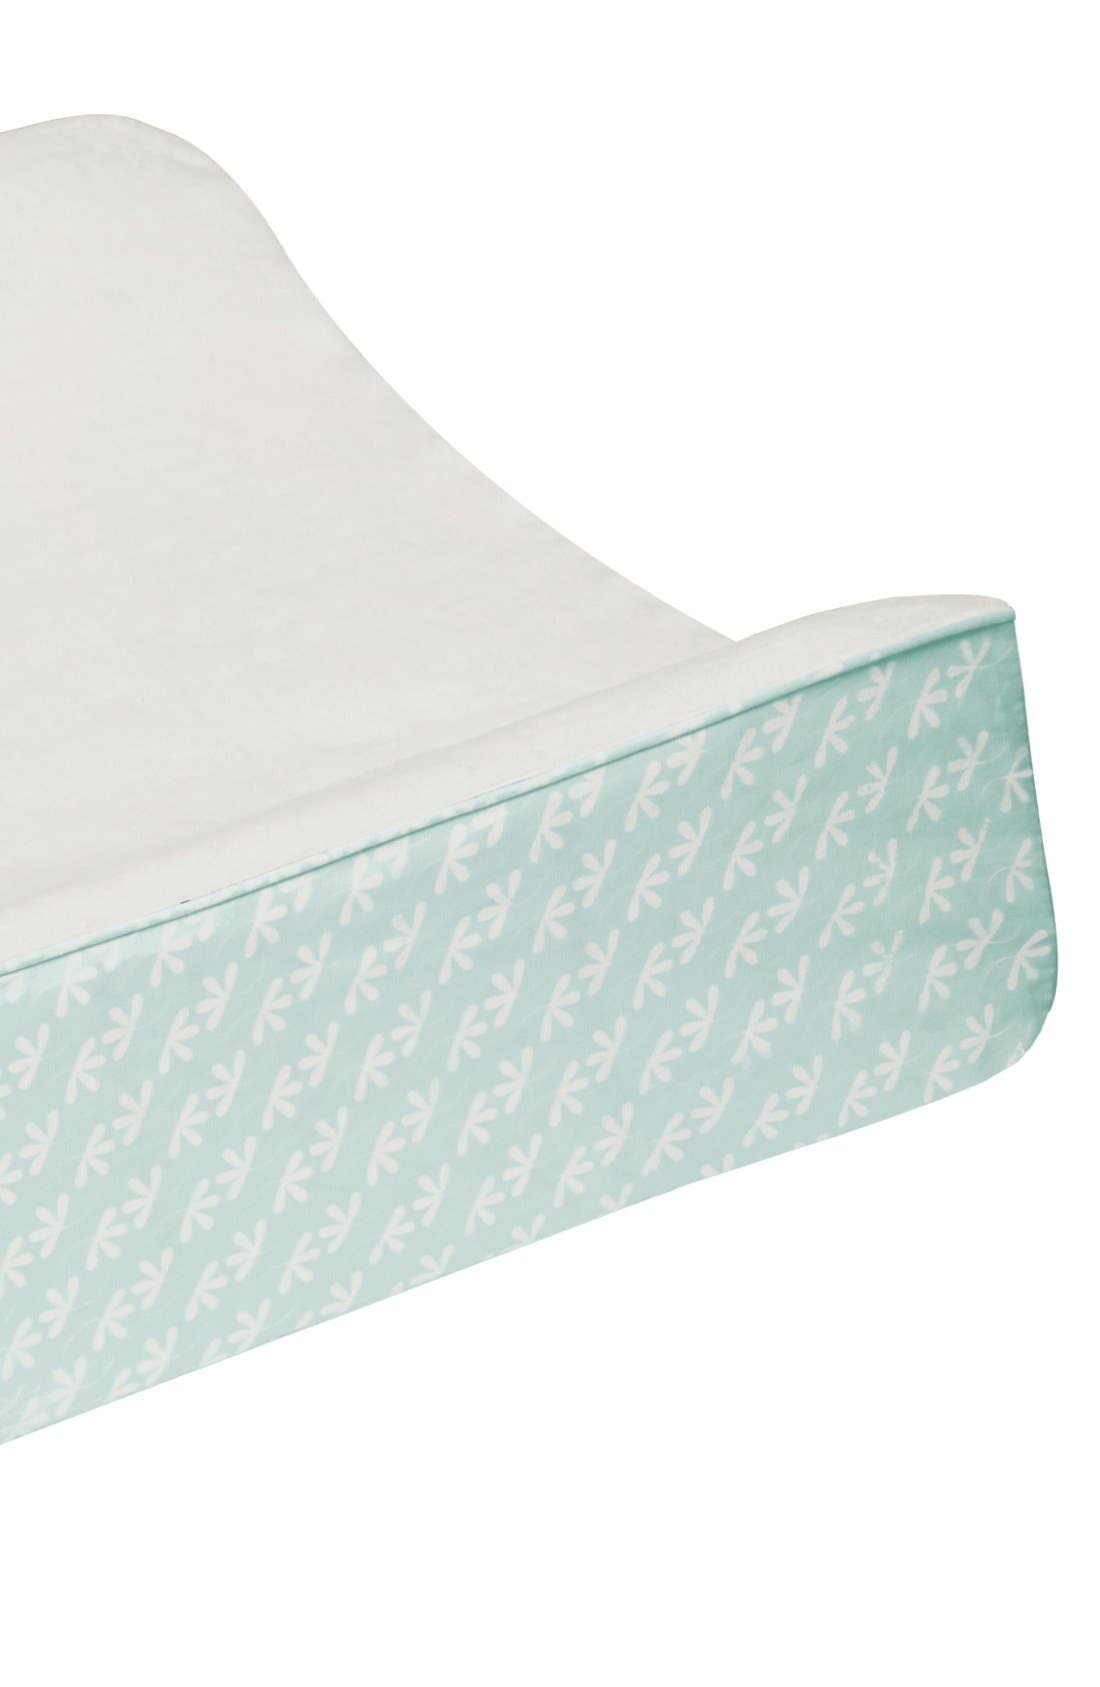 'Flora' Crib Sheet, Crib Skirt, Contour Changing Pad, Play Blanket, Stroller Blanket & Wall Decals,                             Alternate thumbnail 5, color,                             400